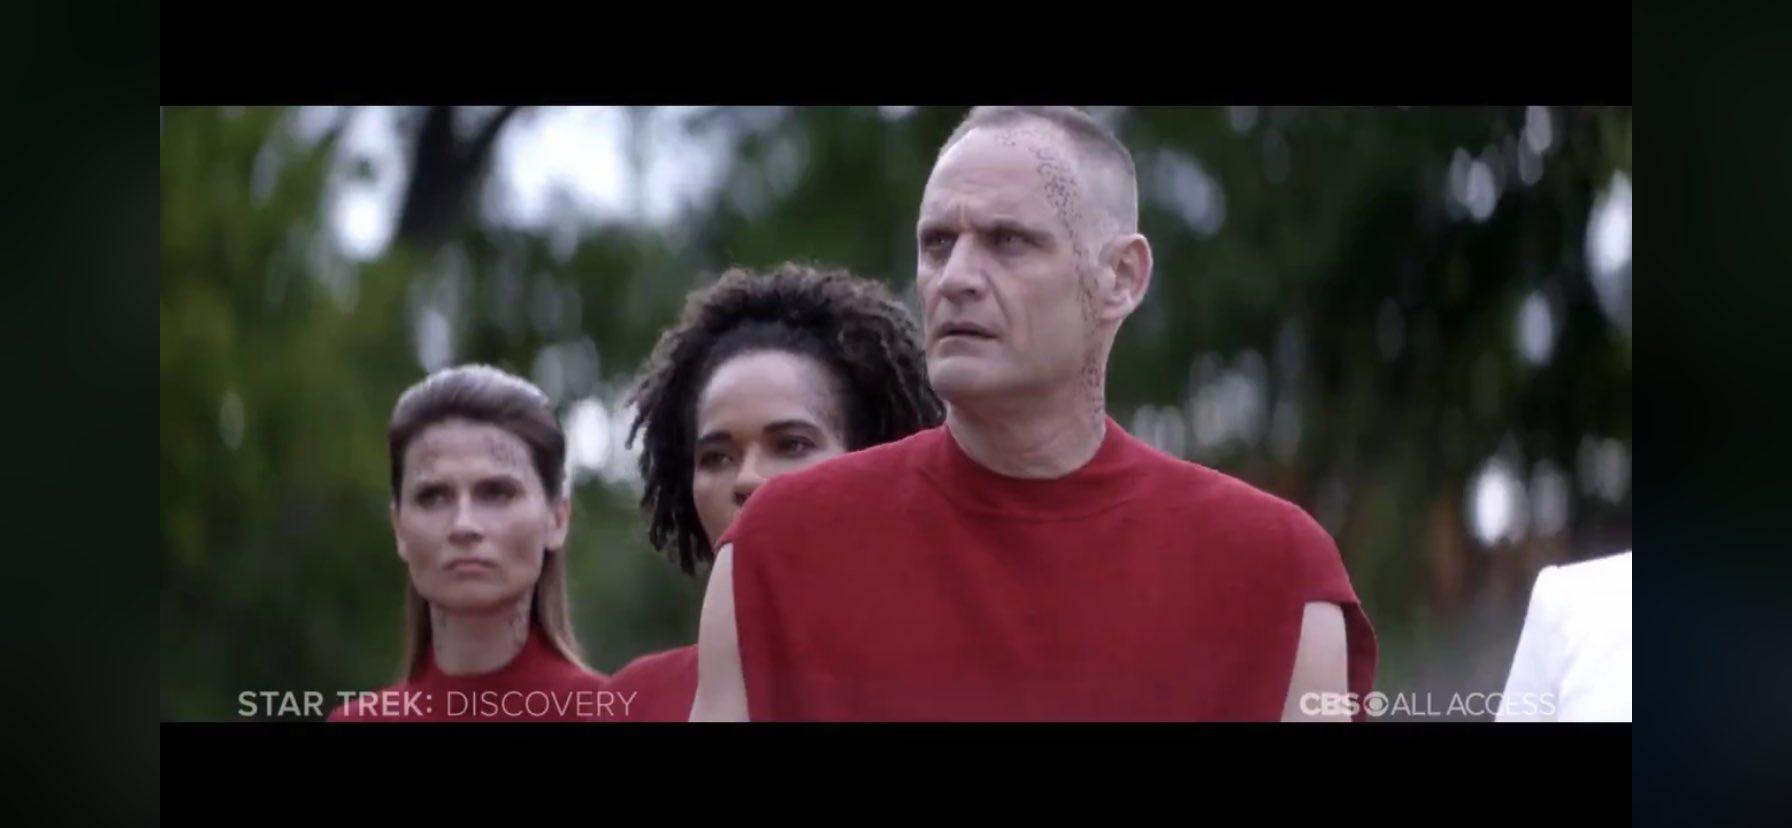 [Série] Star Trek Discovery - Saison 3  EGIf_5oXYAAH6oC?format=jpg&name=large